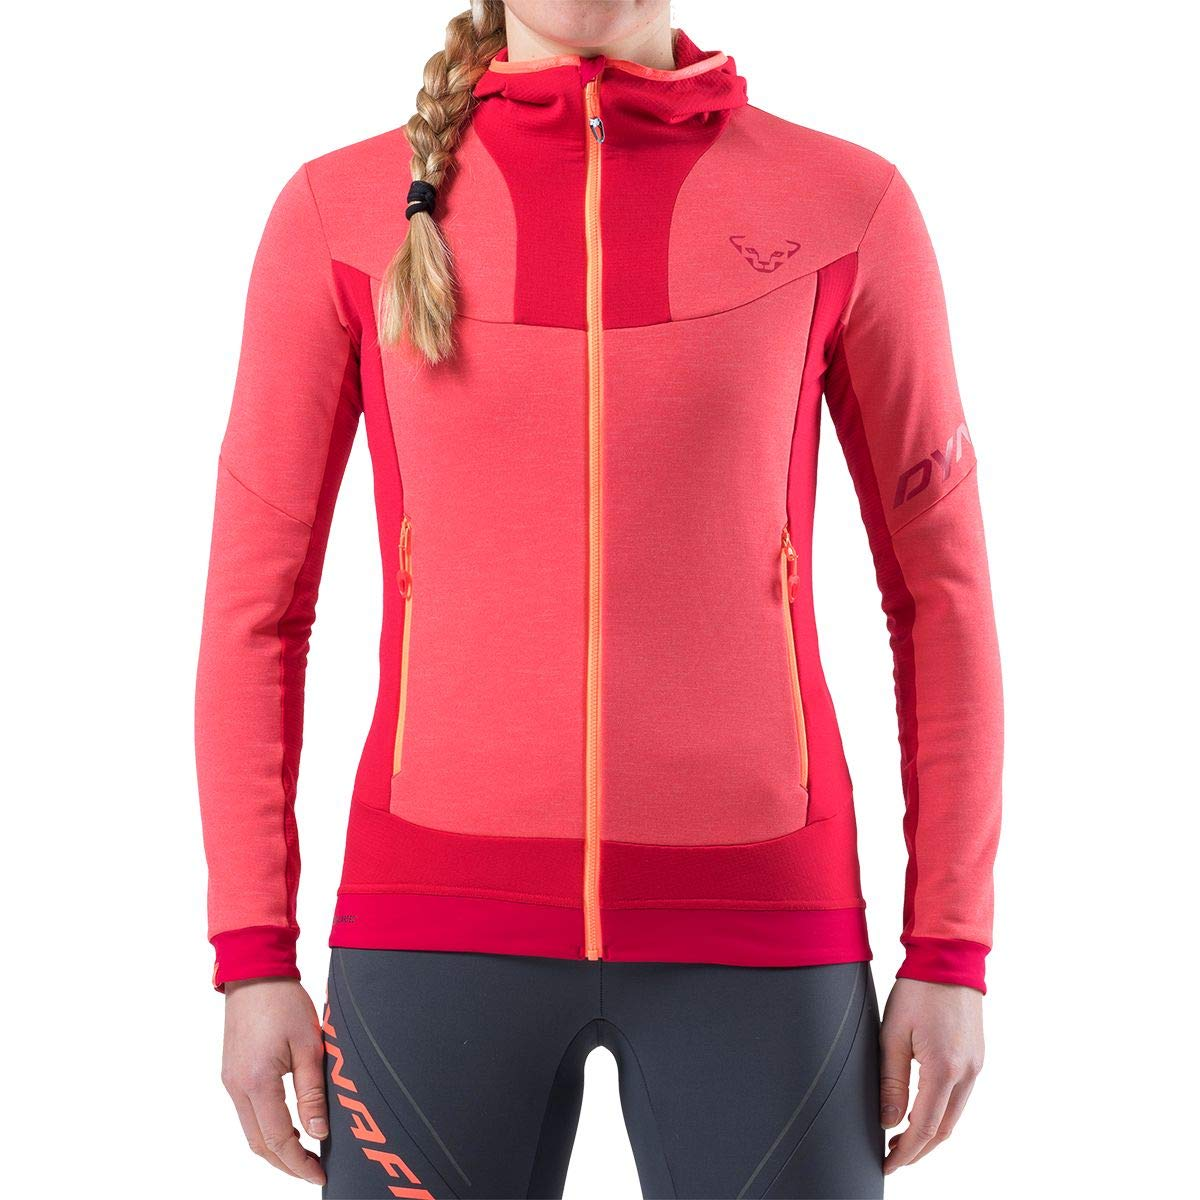 Dynafit Damen FT Pro Thermal PTC Hooded Jacke Isolationsjacke NEU